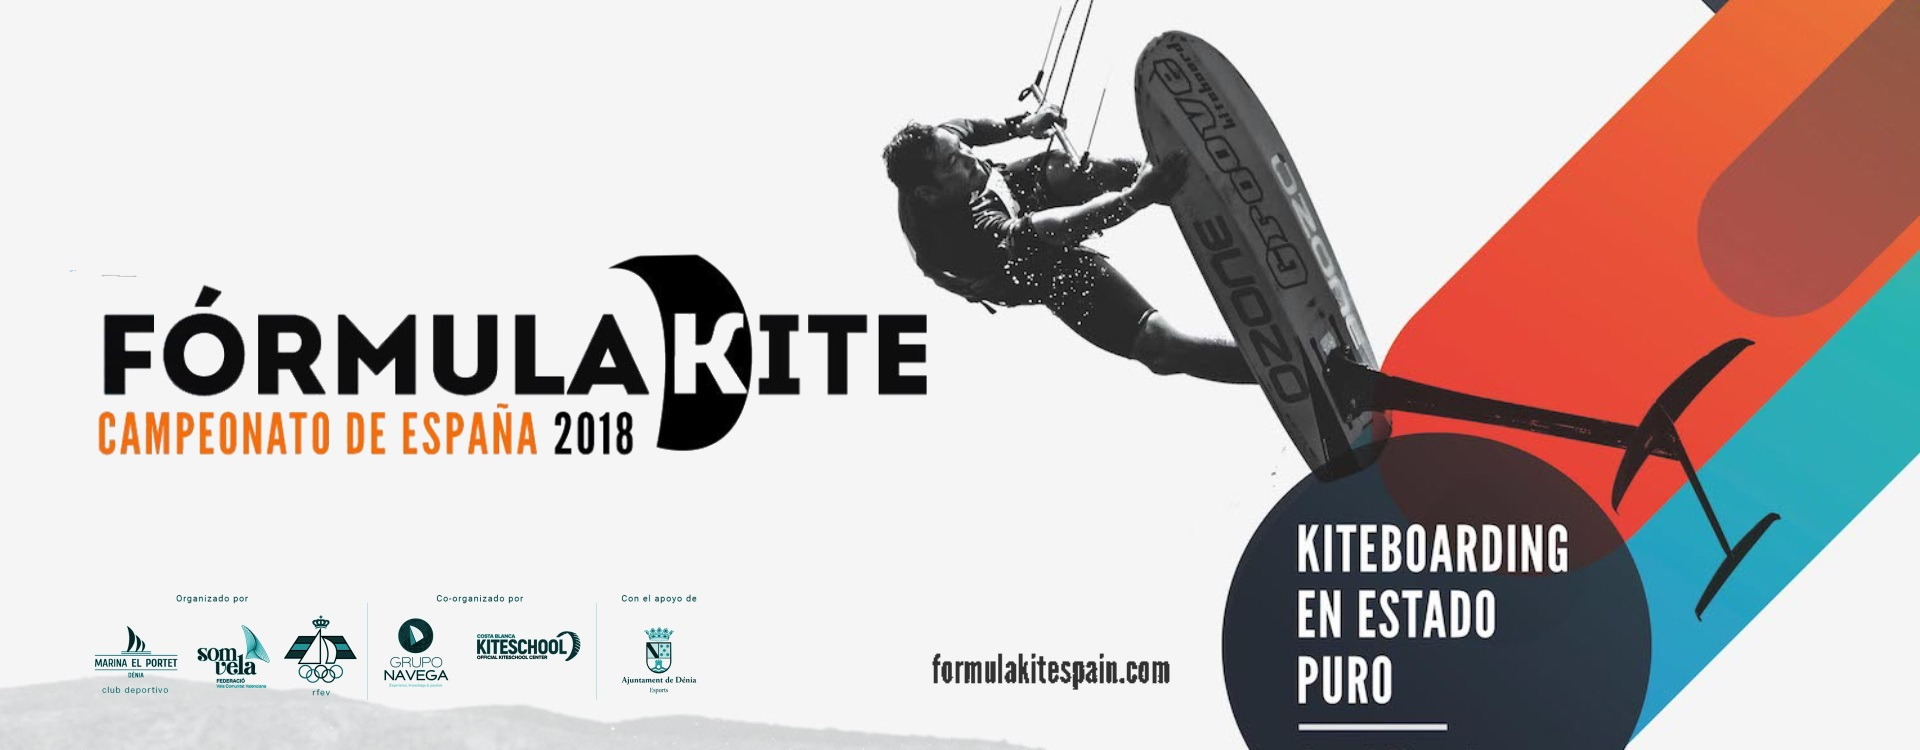 Fórmula Kite Spain Series Denia Marina el Portet Perfect Pixel Publicidad Agencia Madrid